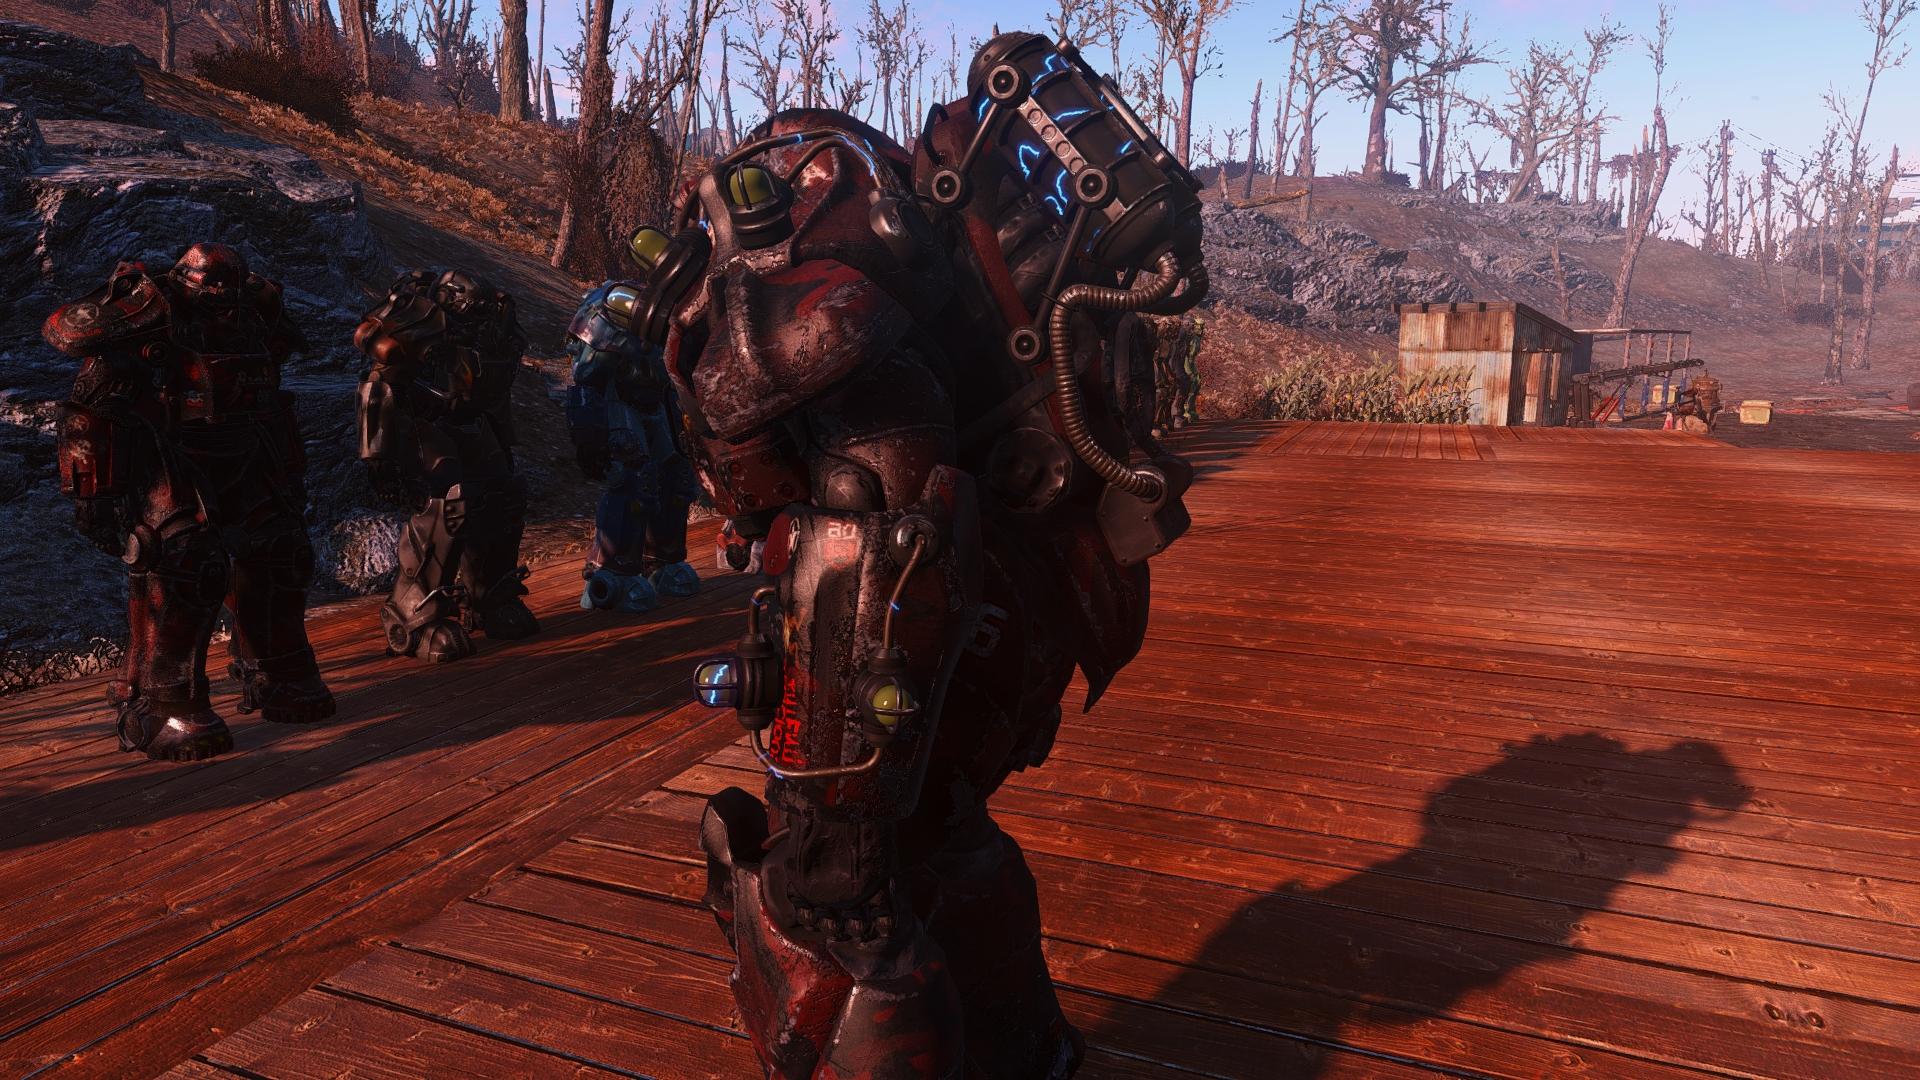 00013.Jpg - Fallout 4